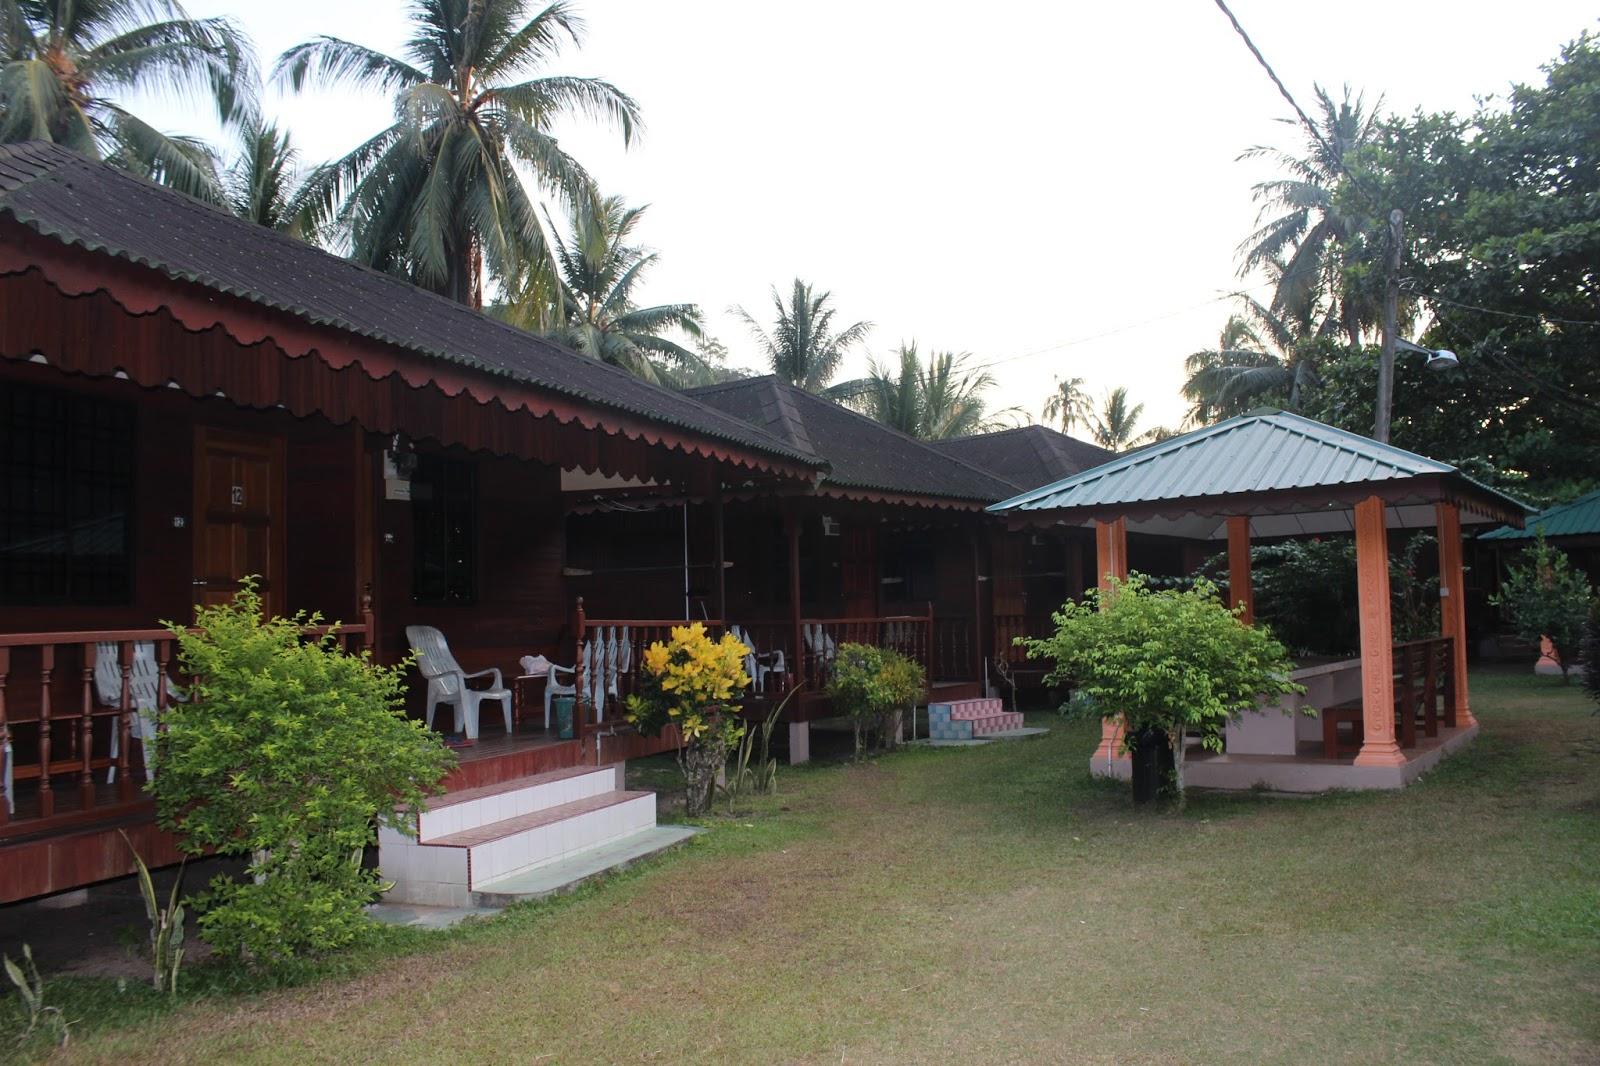 pakej-pulau-tioman-salang-pusaka-surrounding-12